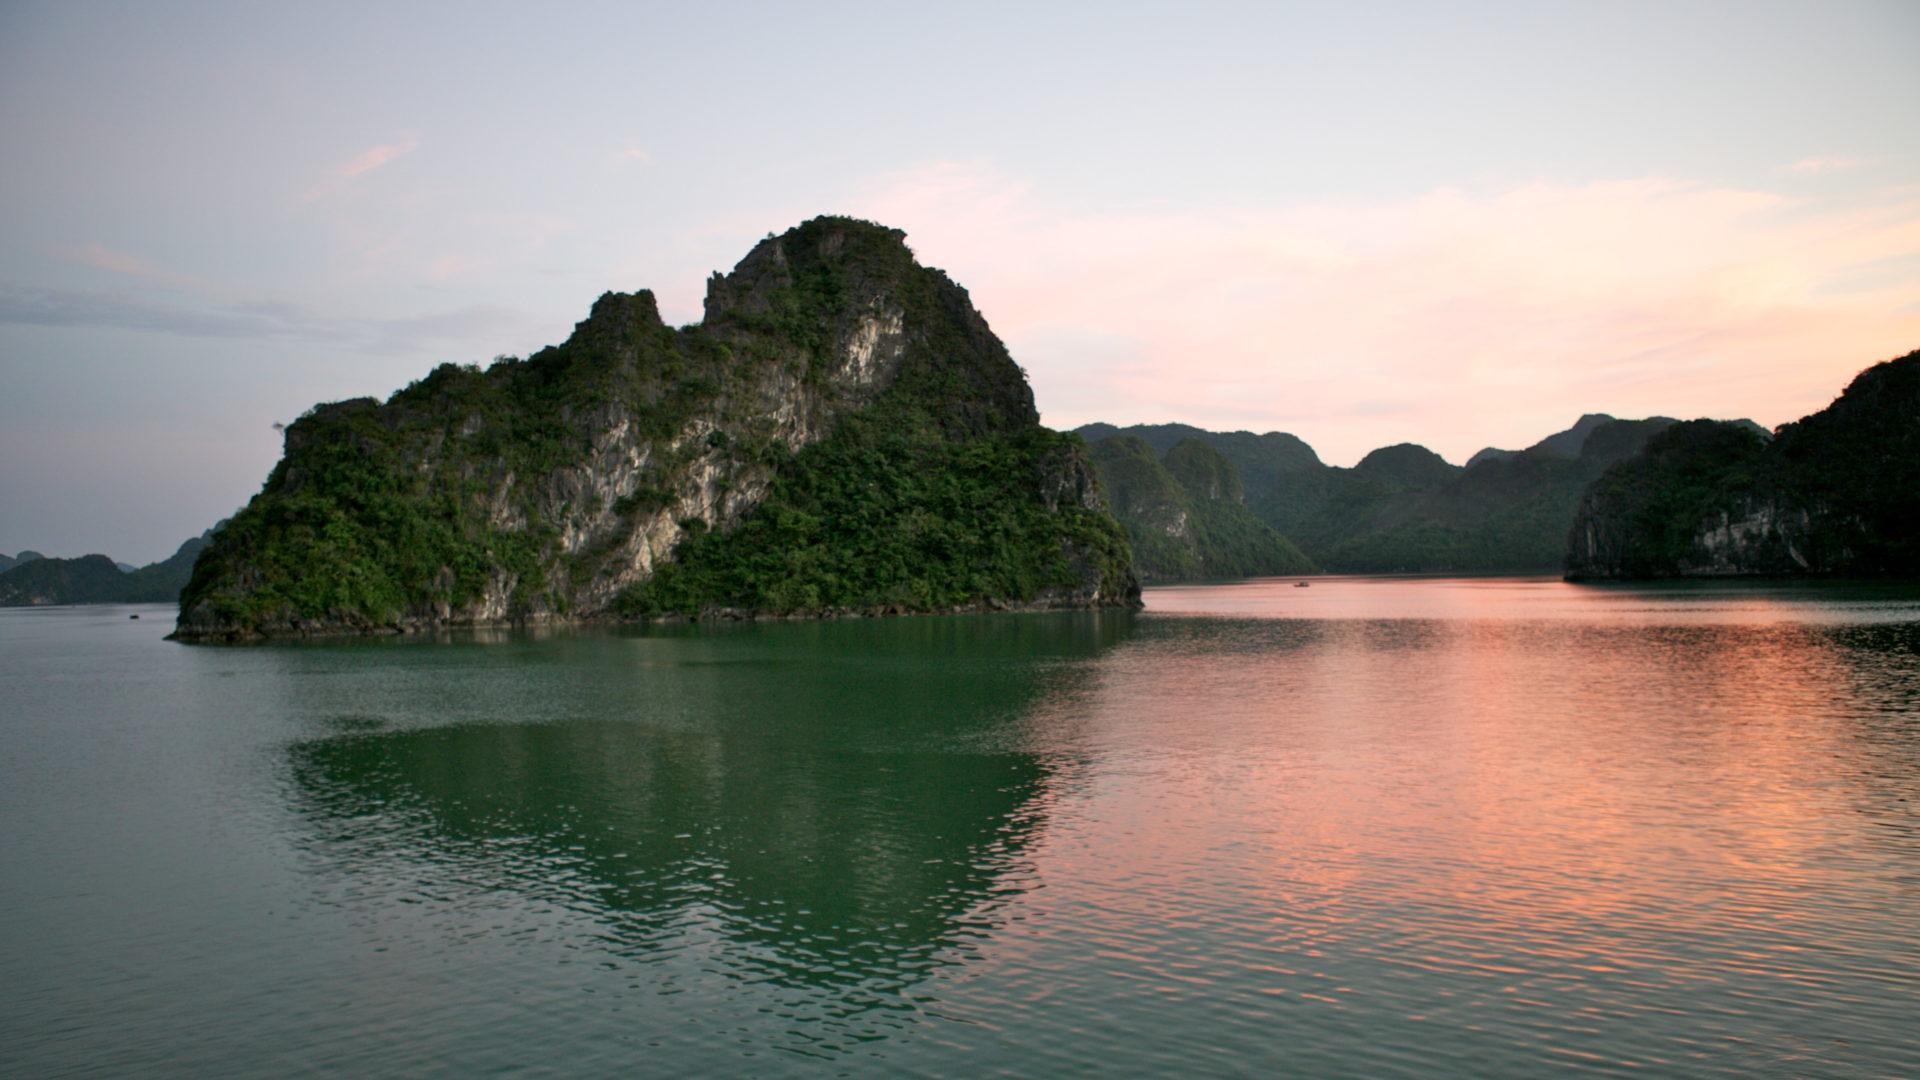 https://nature.new7wonders.com/wonders/ha-long-bay-vietnam/